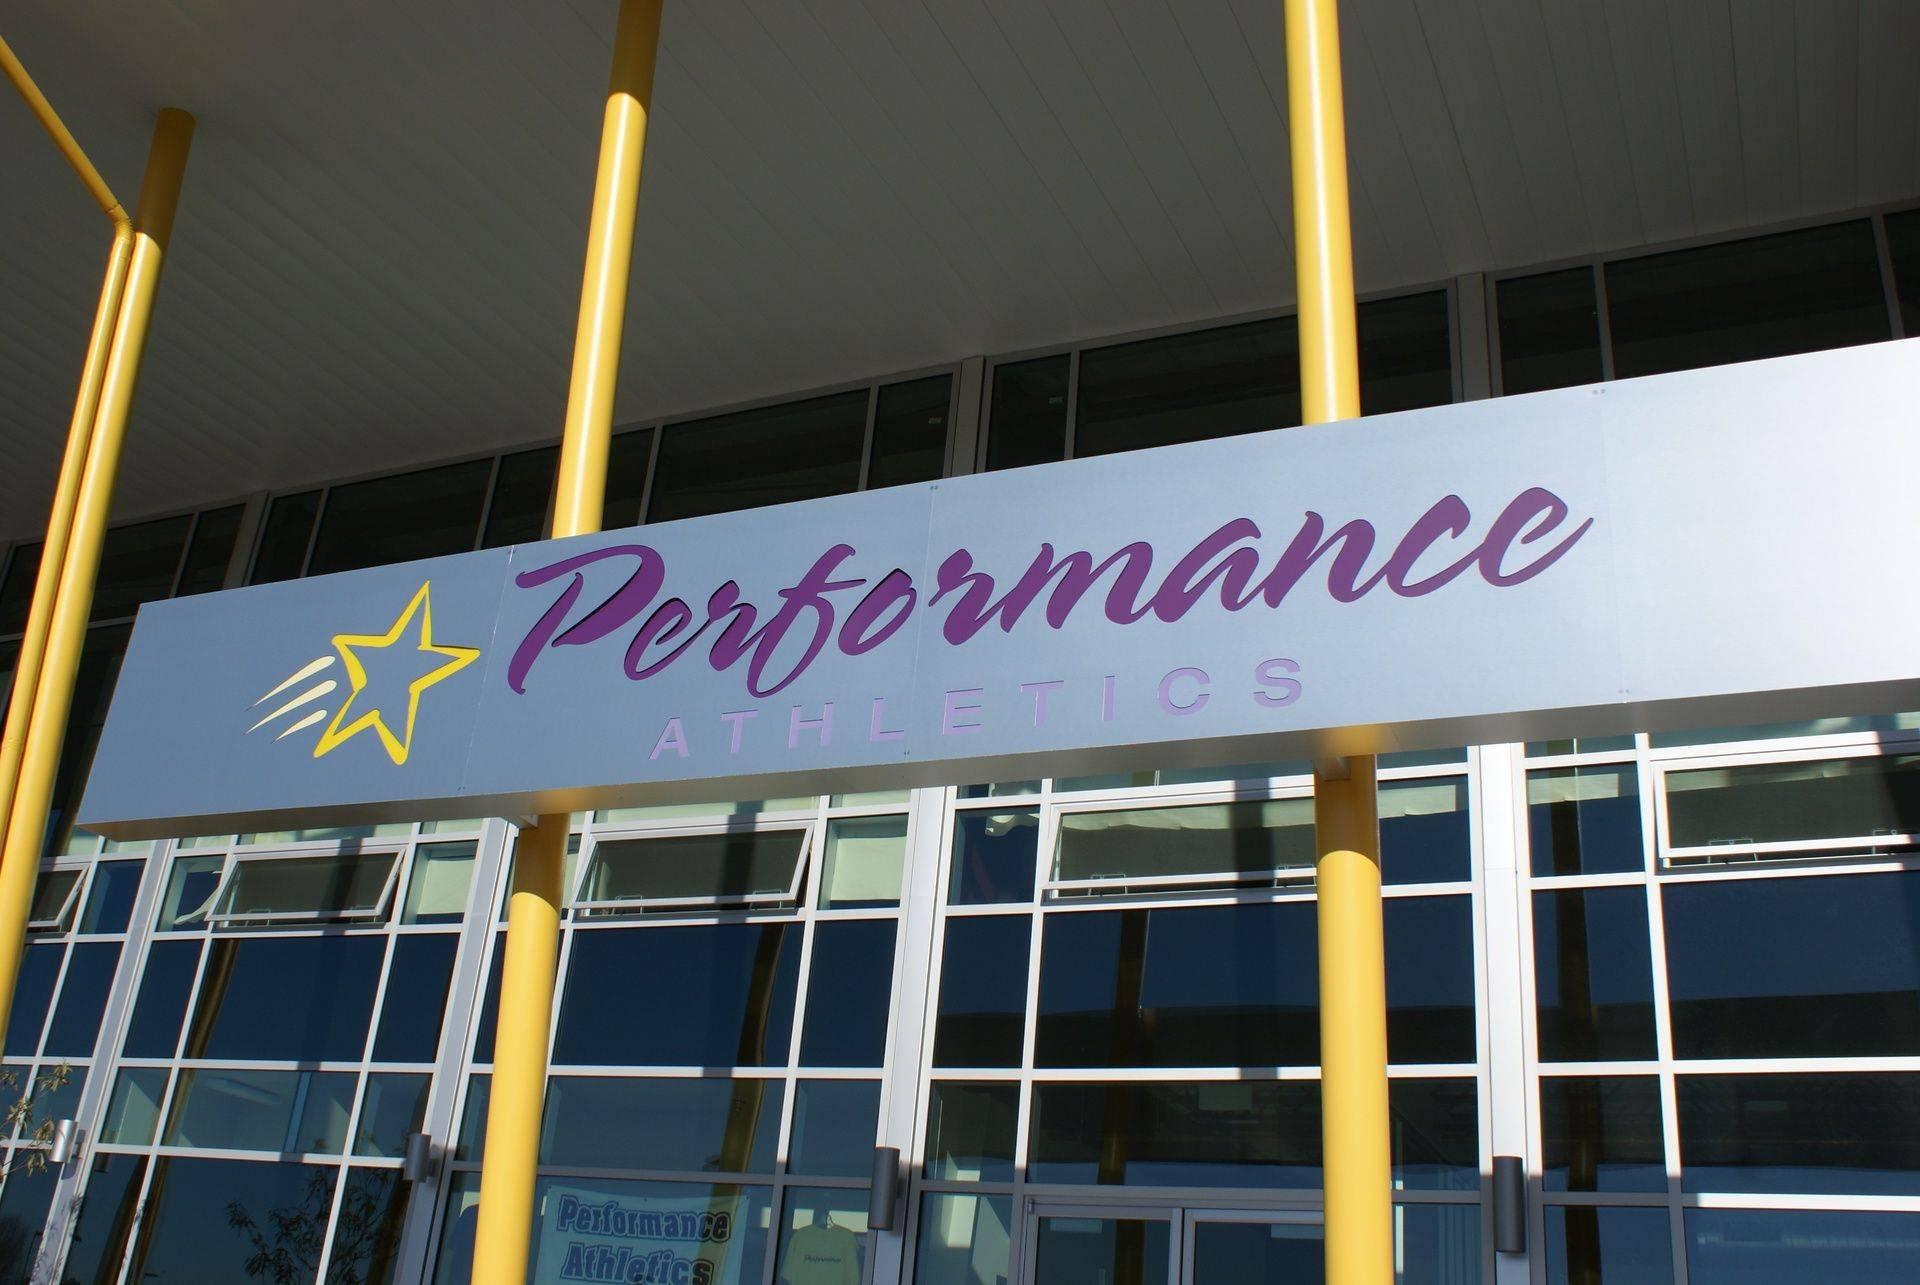 Performance Athletics Gymnastics